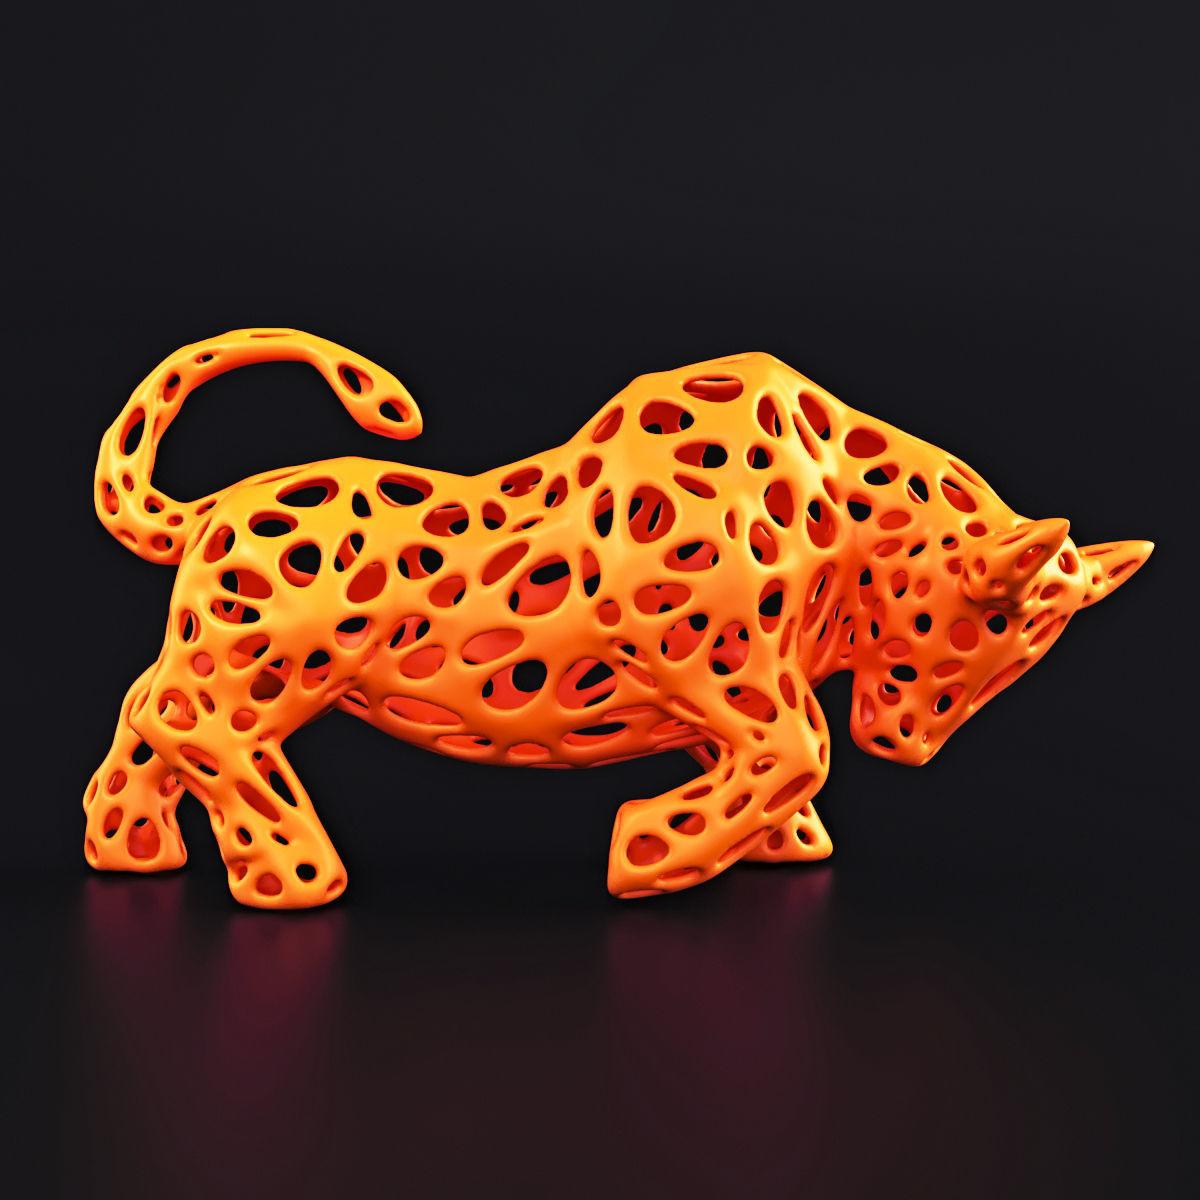 Bull Wireframe